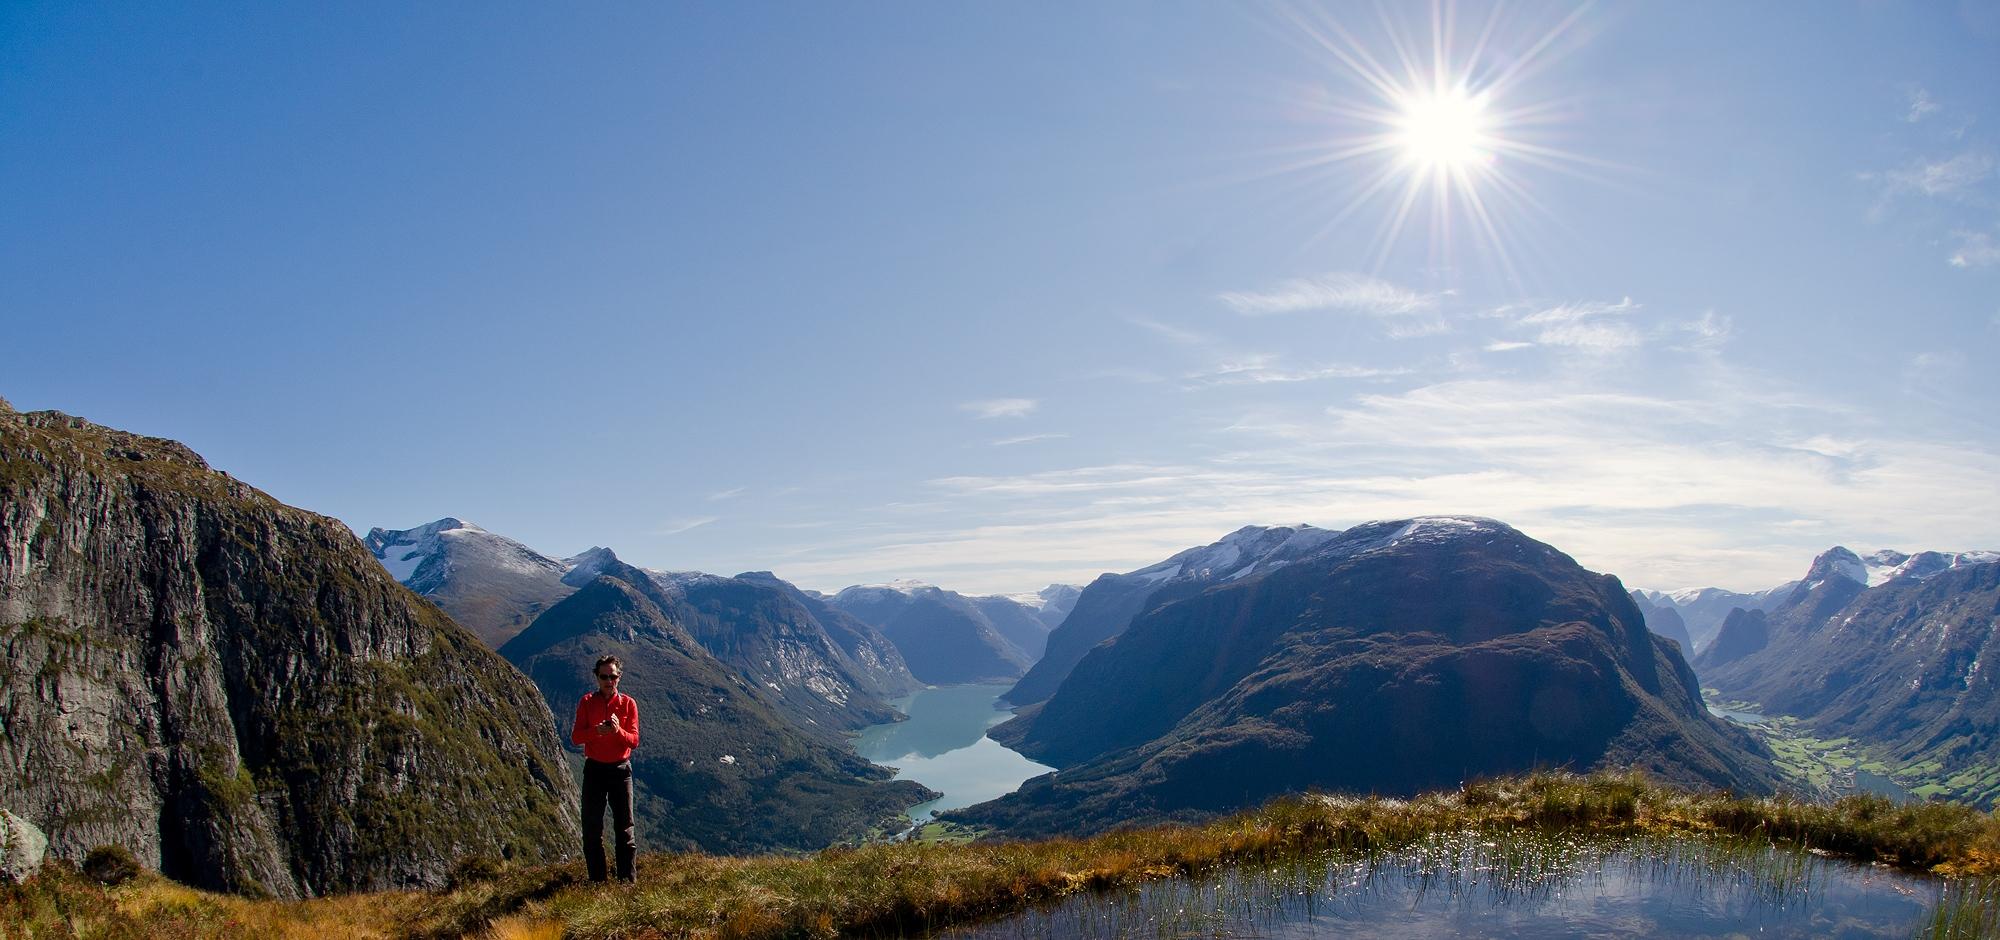 Vandring i Nordfjord Foto_Ernst Riha.jpg